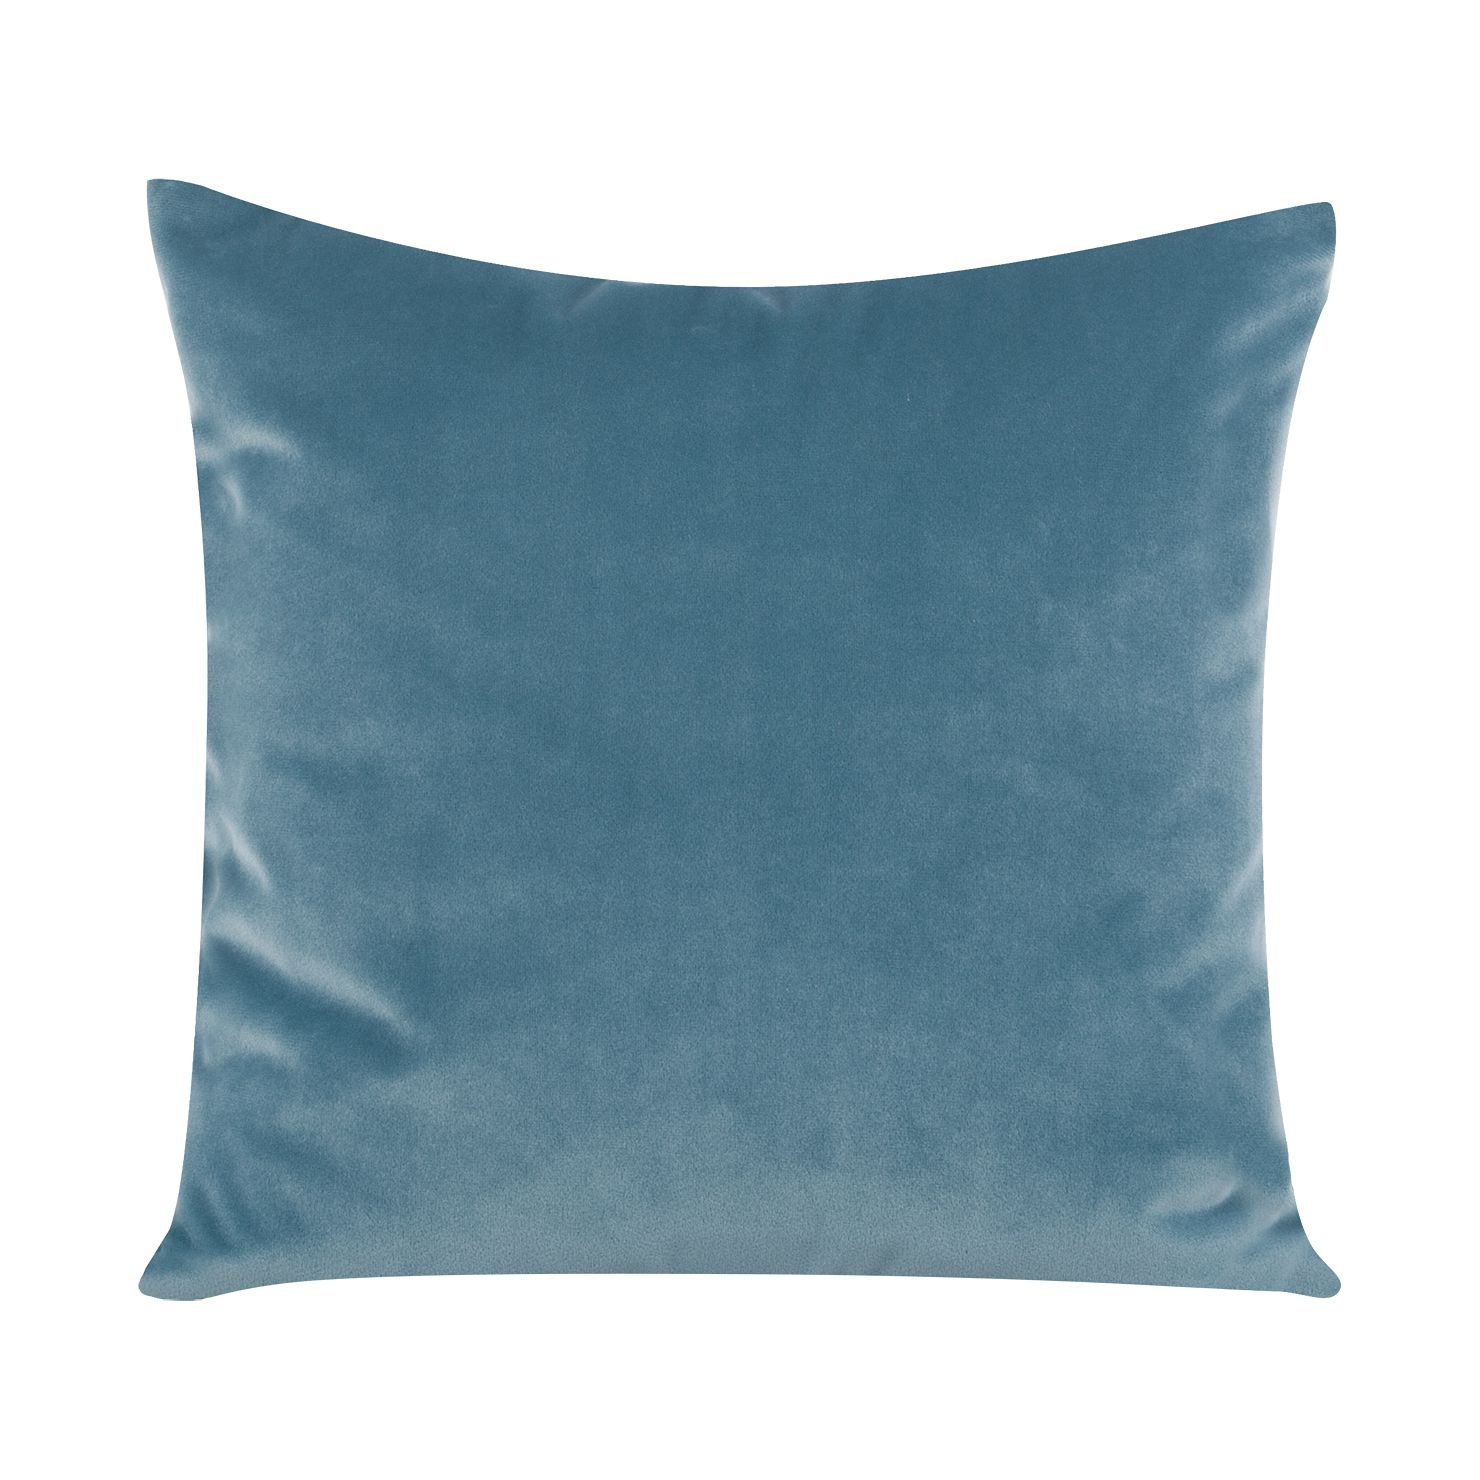 Kussensloop Shine Bright - hemelsblauw 40x40cm - Pastelblauw - 40x40cm, Jack and Alice